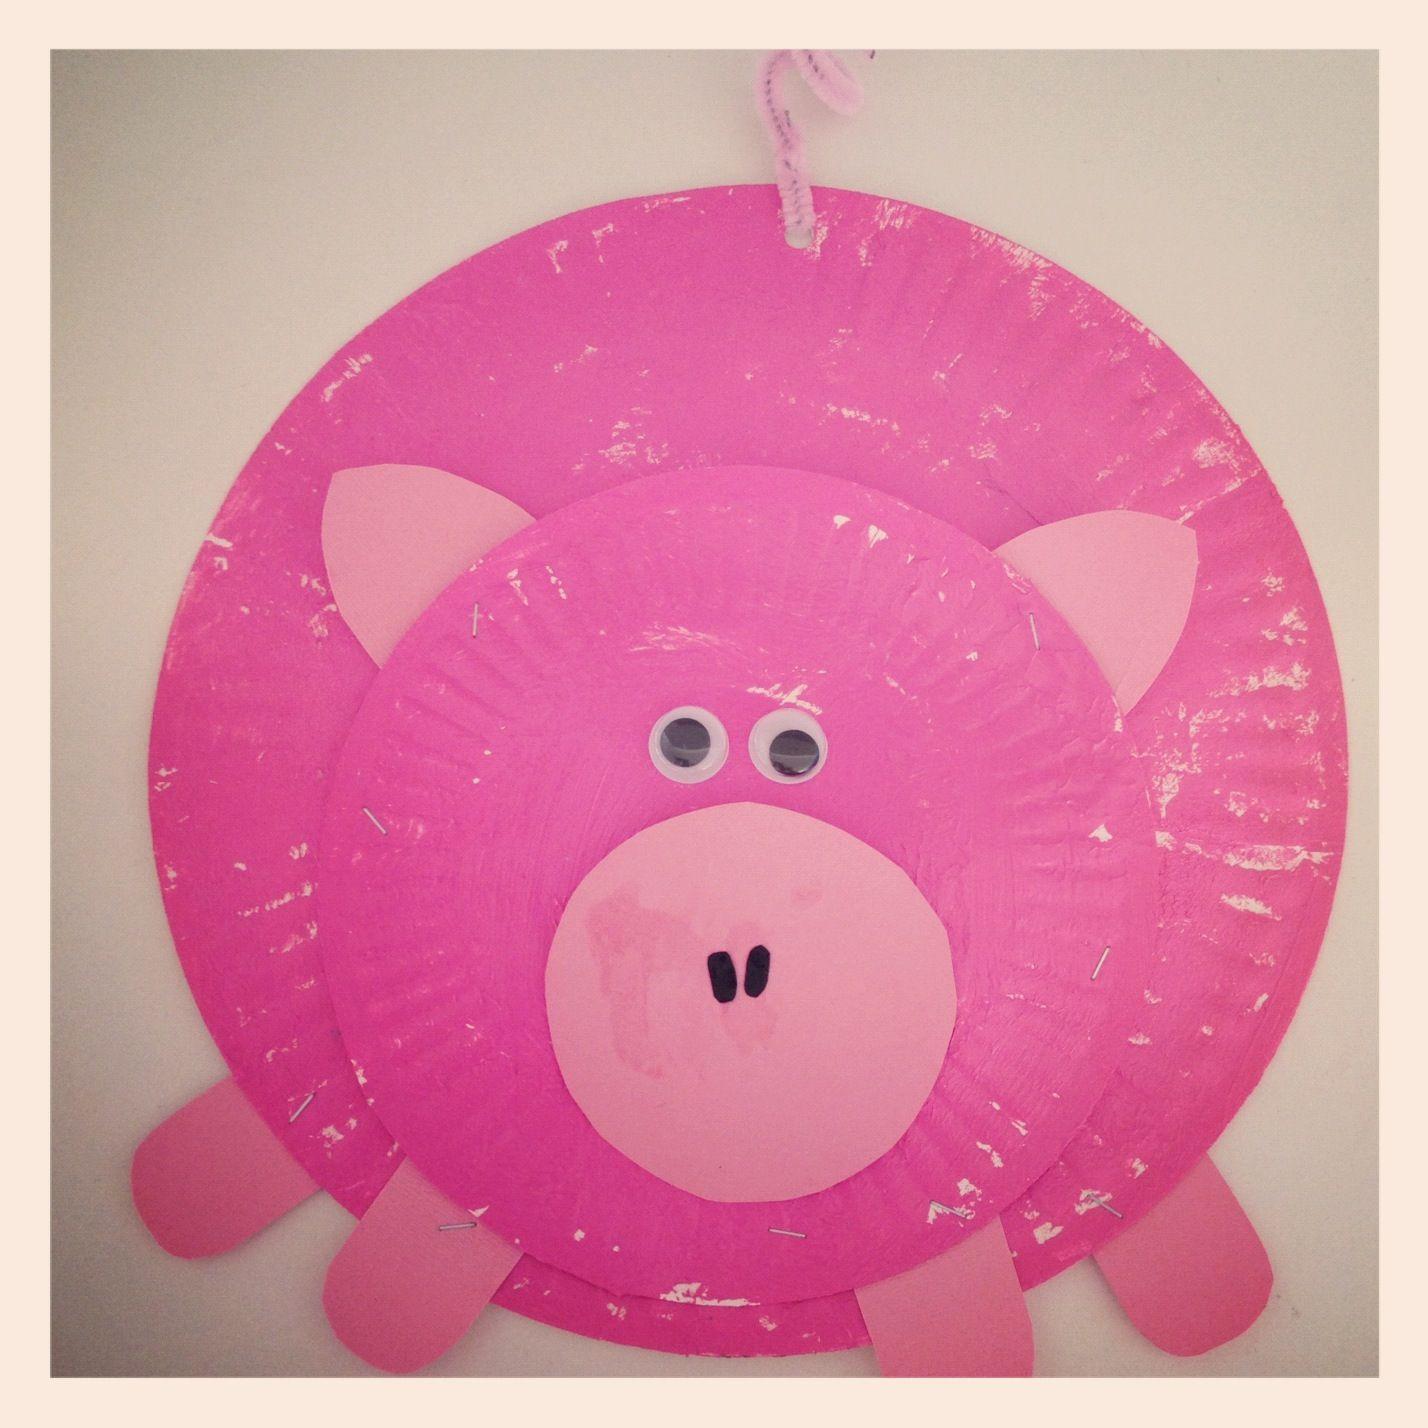 Paper plate animal crafts - Jpg 1 428 1 428 Pixels Farm Animals Pinterest